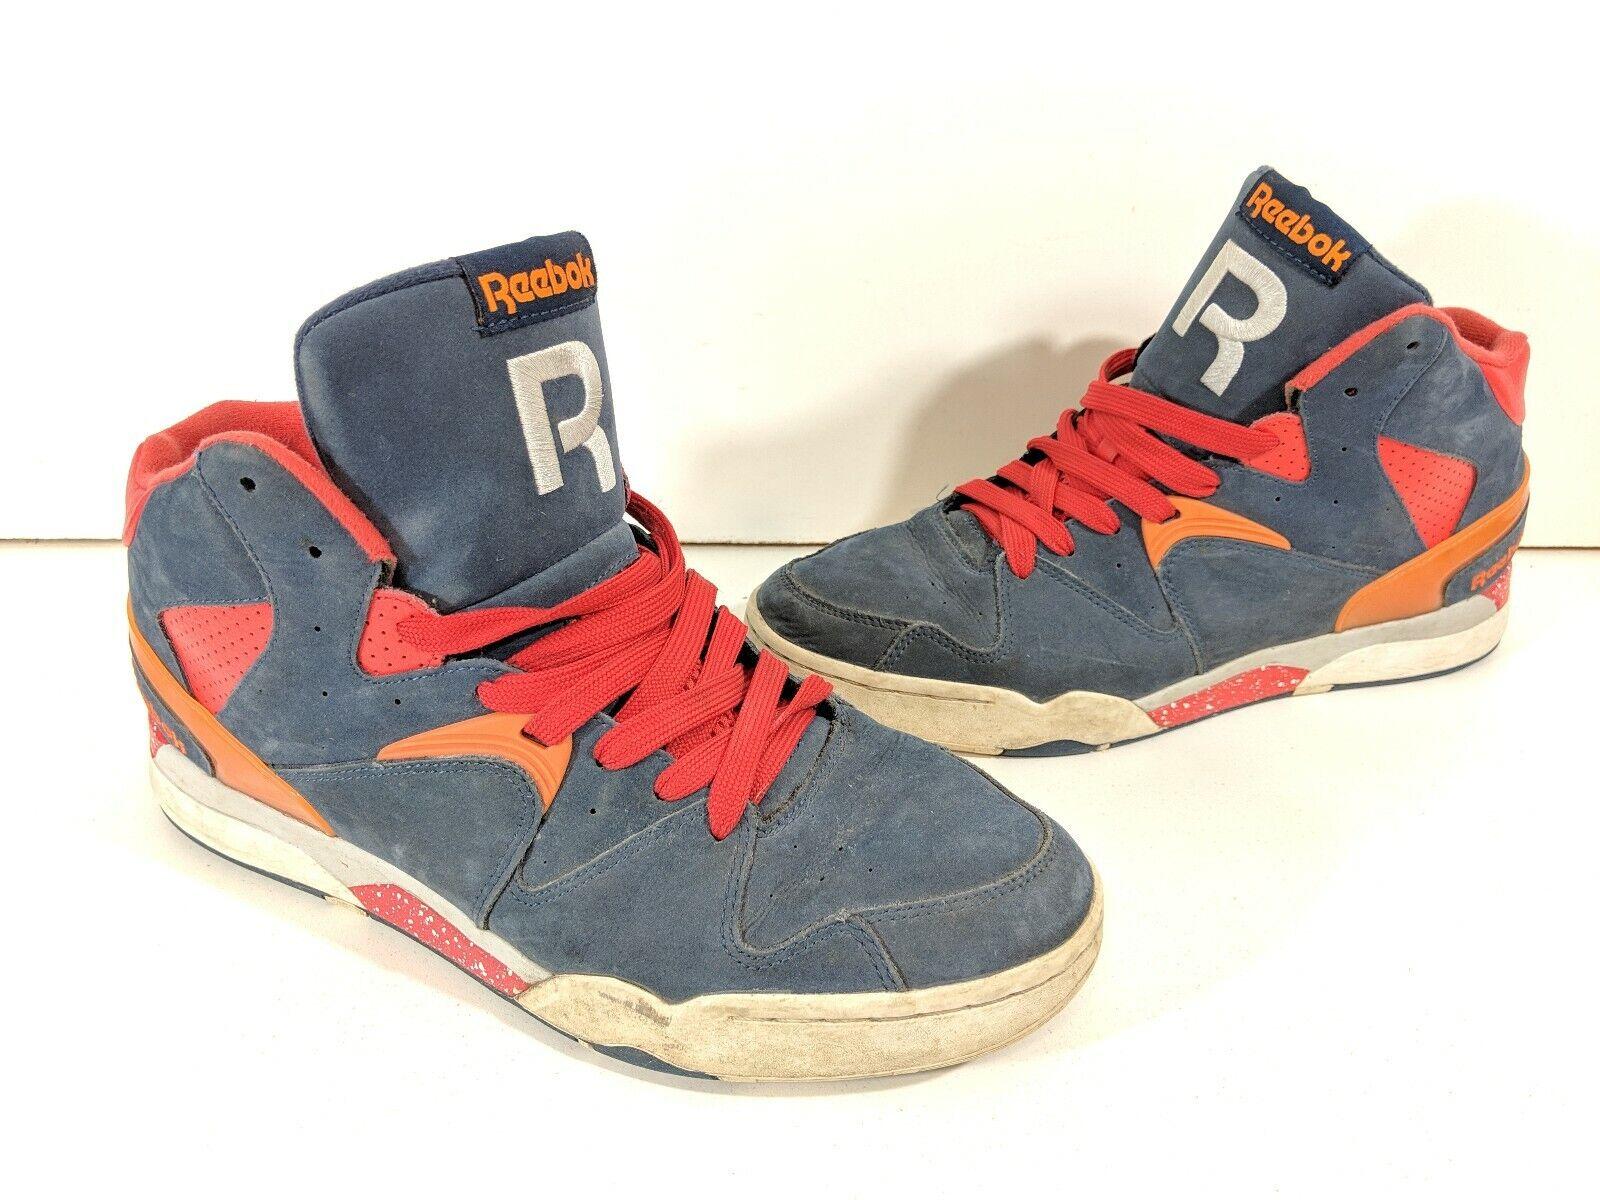 Reebok Classic Jam J95779 - Men's Size 11 Red bluee orange